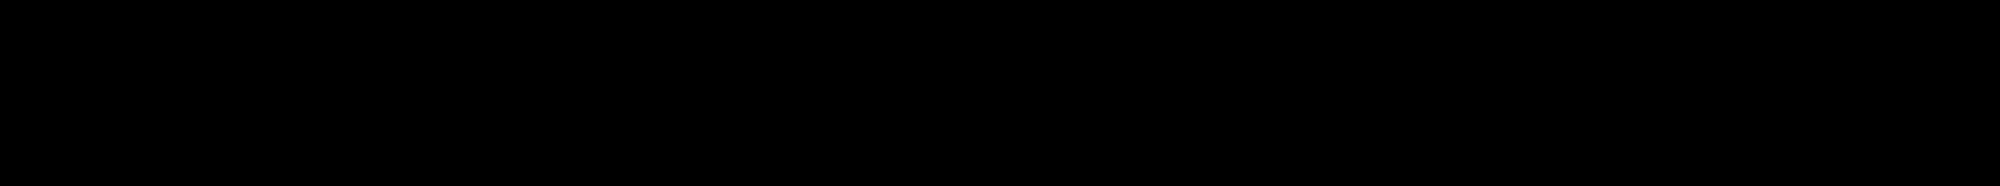 harry-winston-logo-new.png